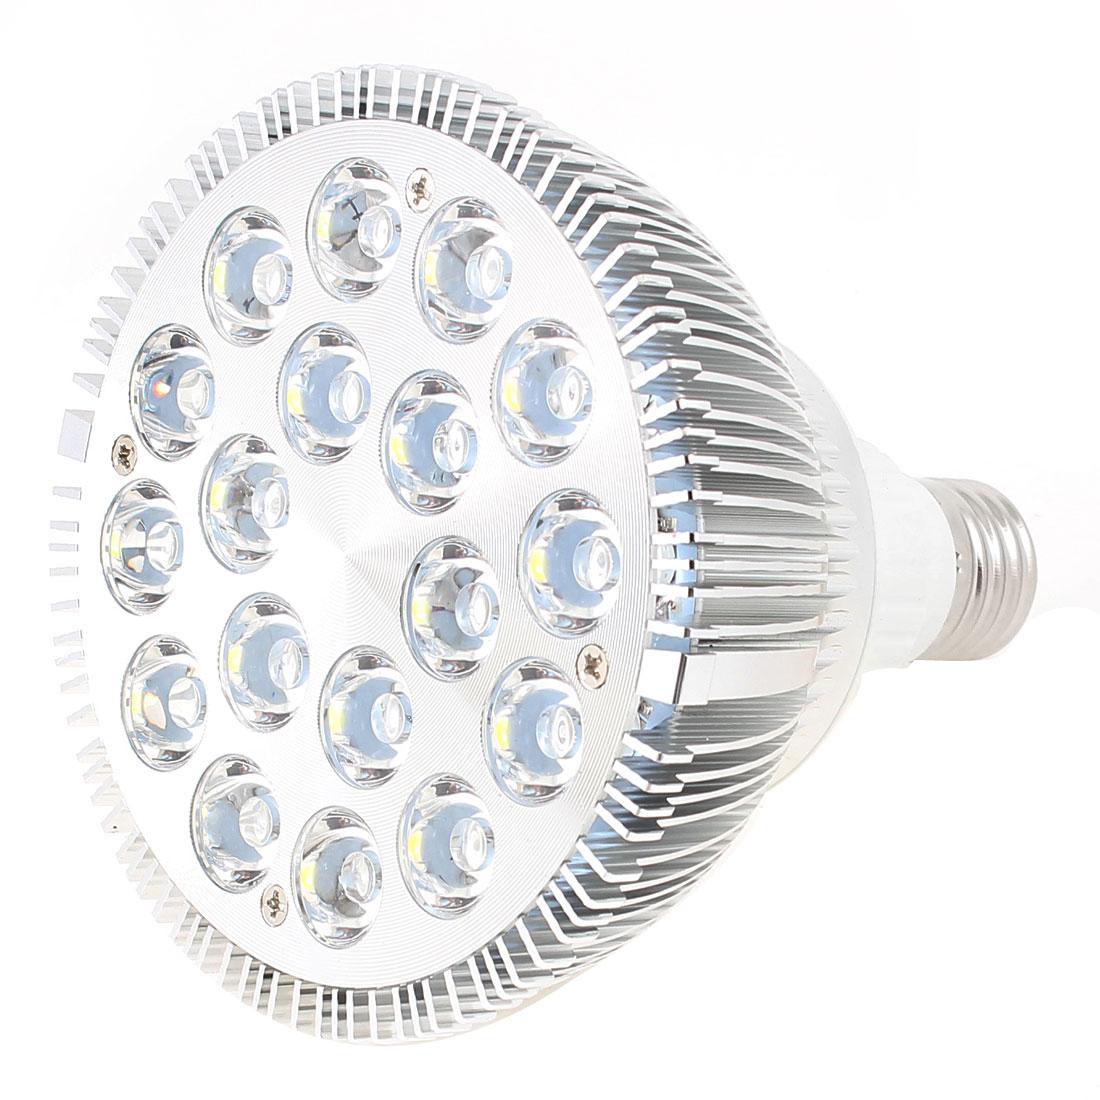 Dimmable 18x2W 36W E27 120 Degree Beam Angle Natural White Par38 LED Spotlight Lamp 110V